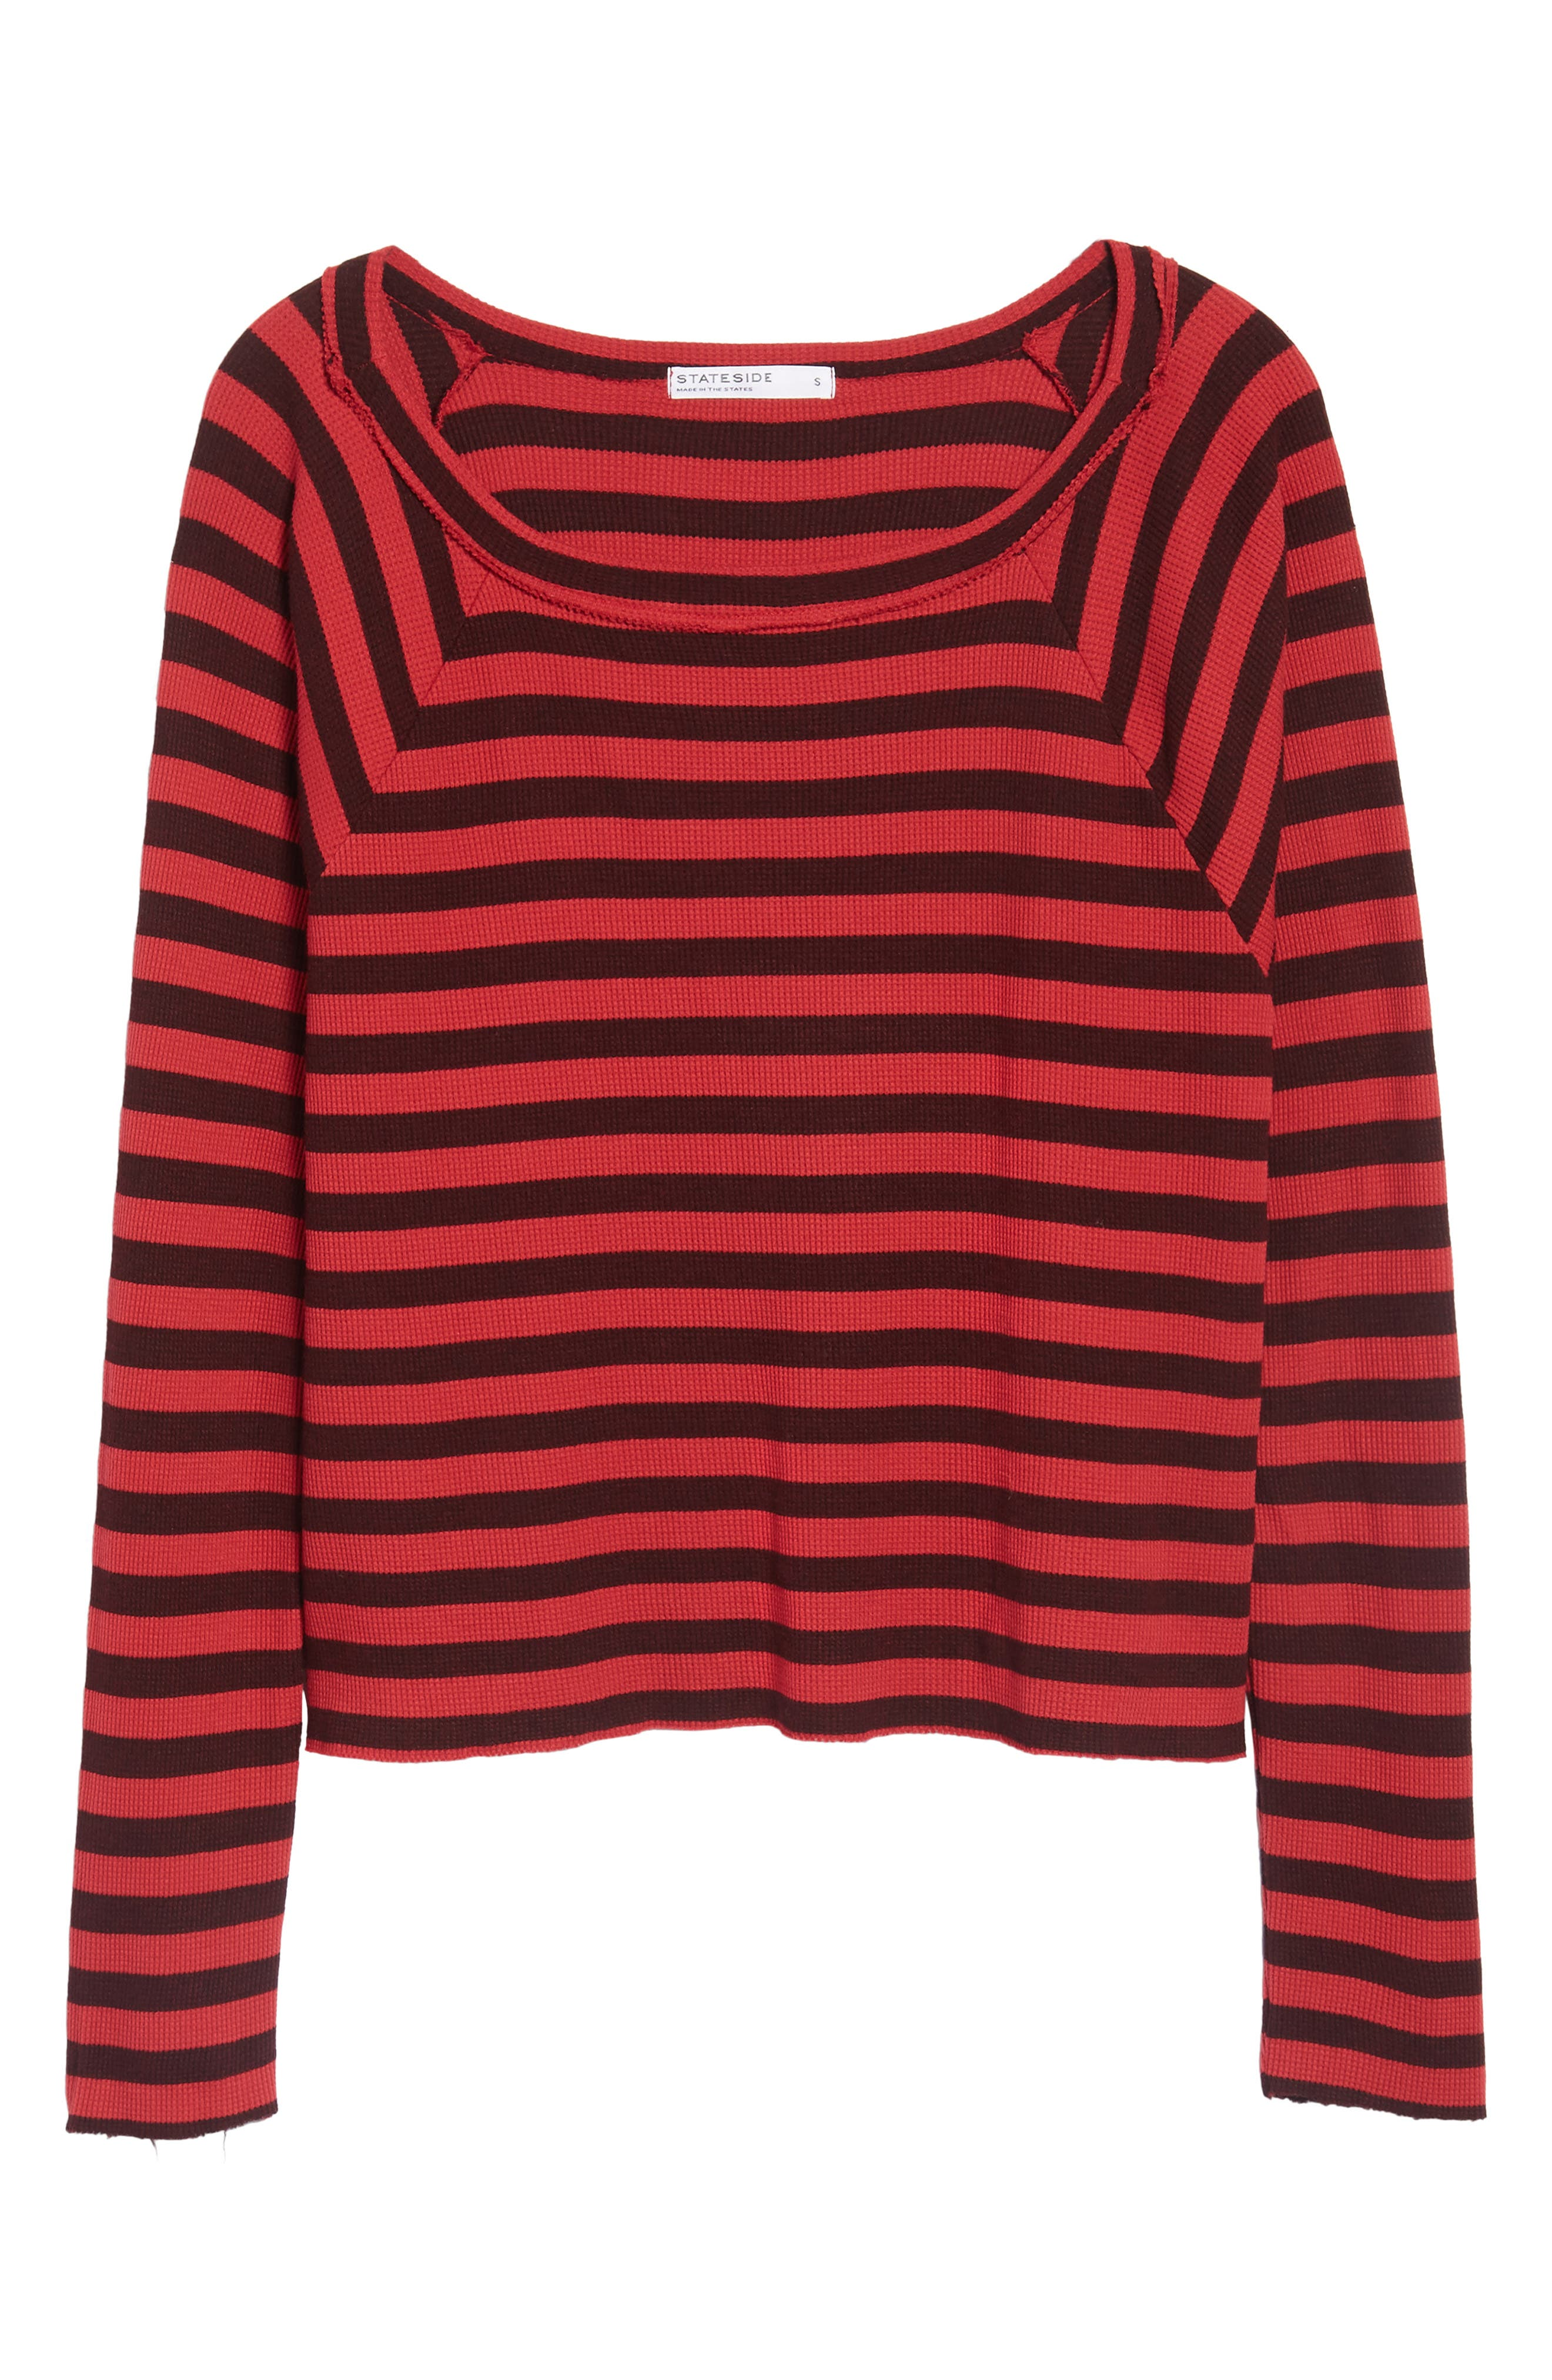 Stripe Thermal Top,                             Alternate thumbnail 6, color,                             Scarlet